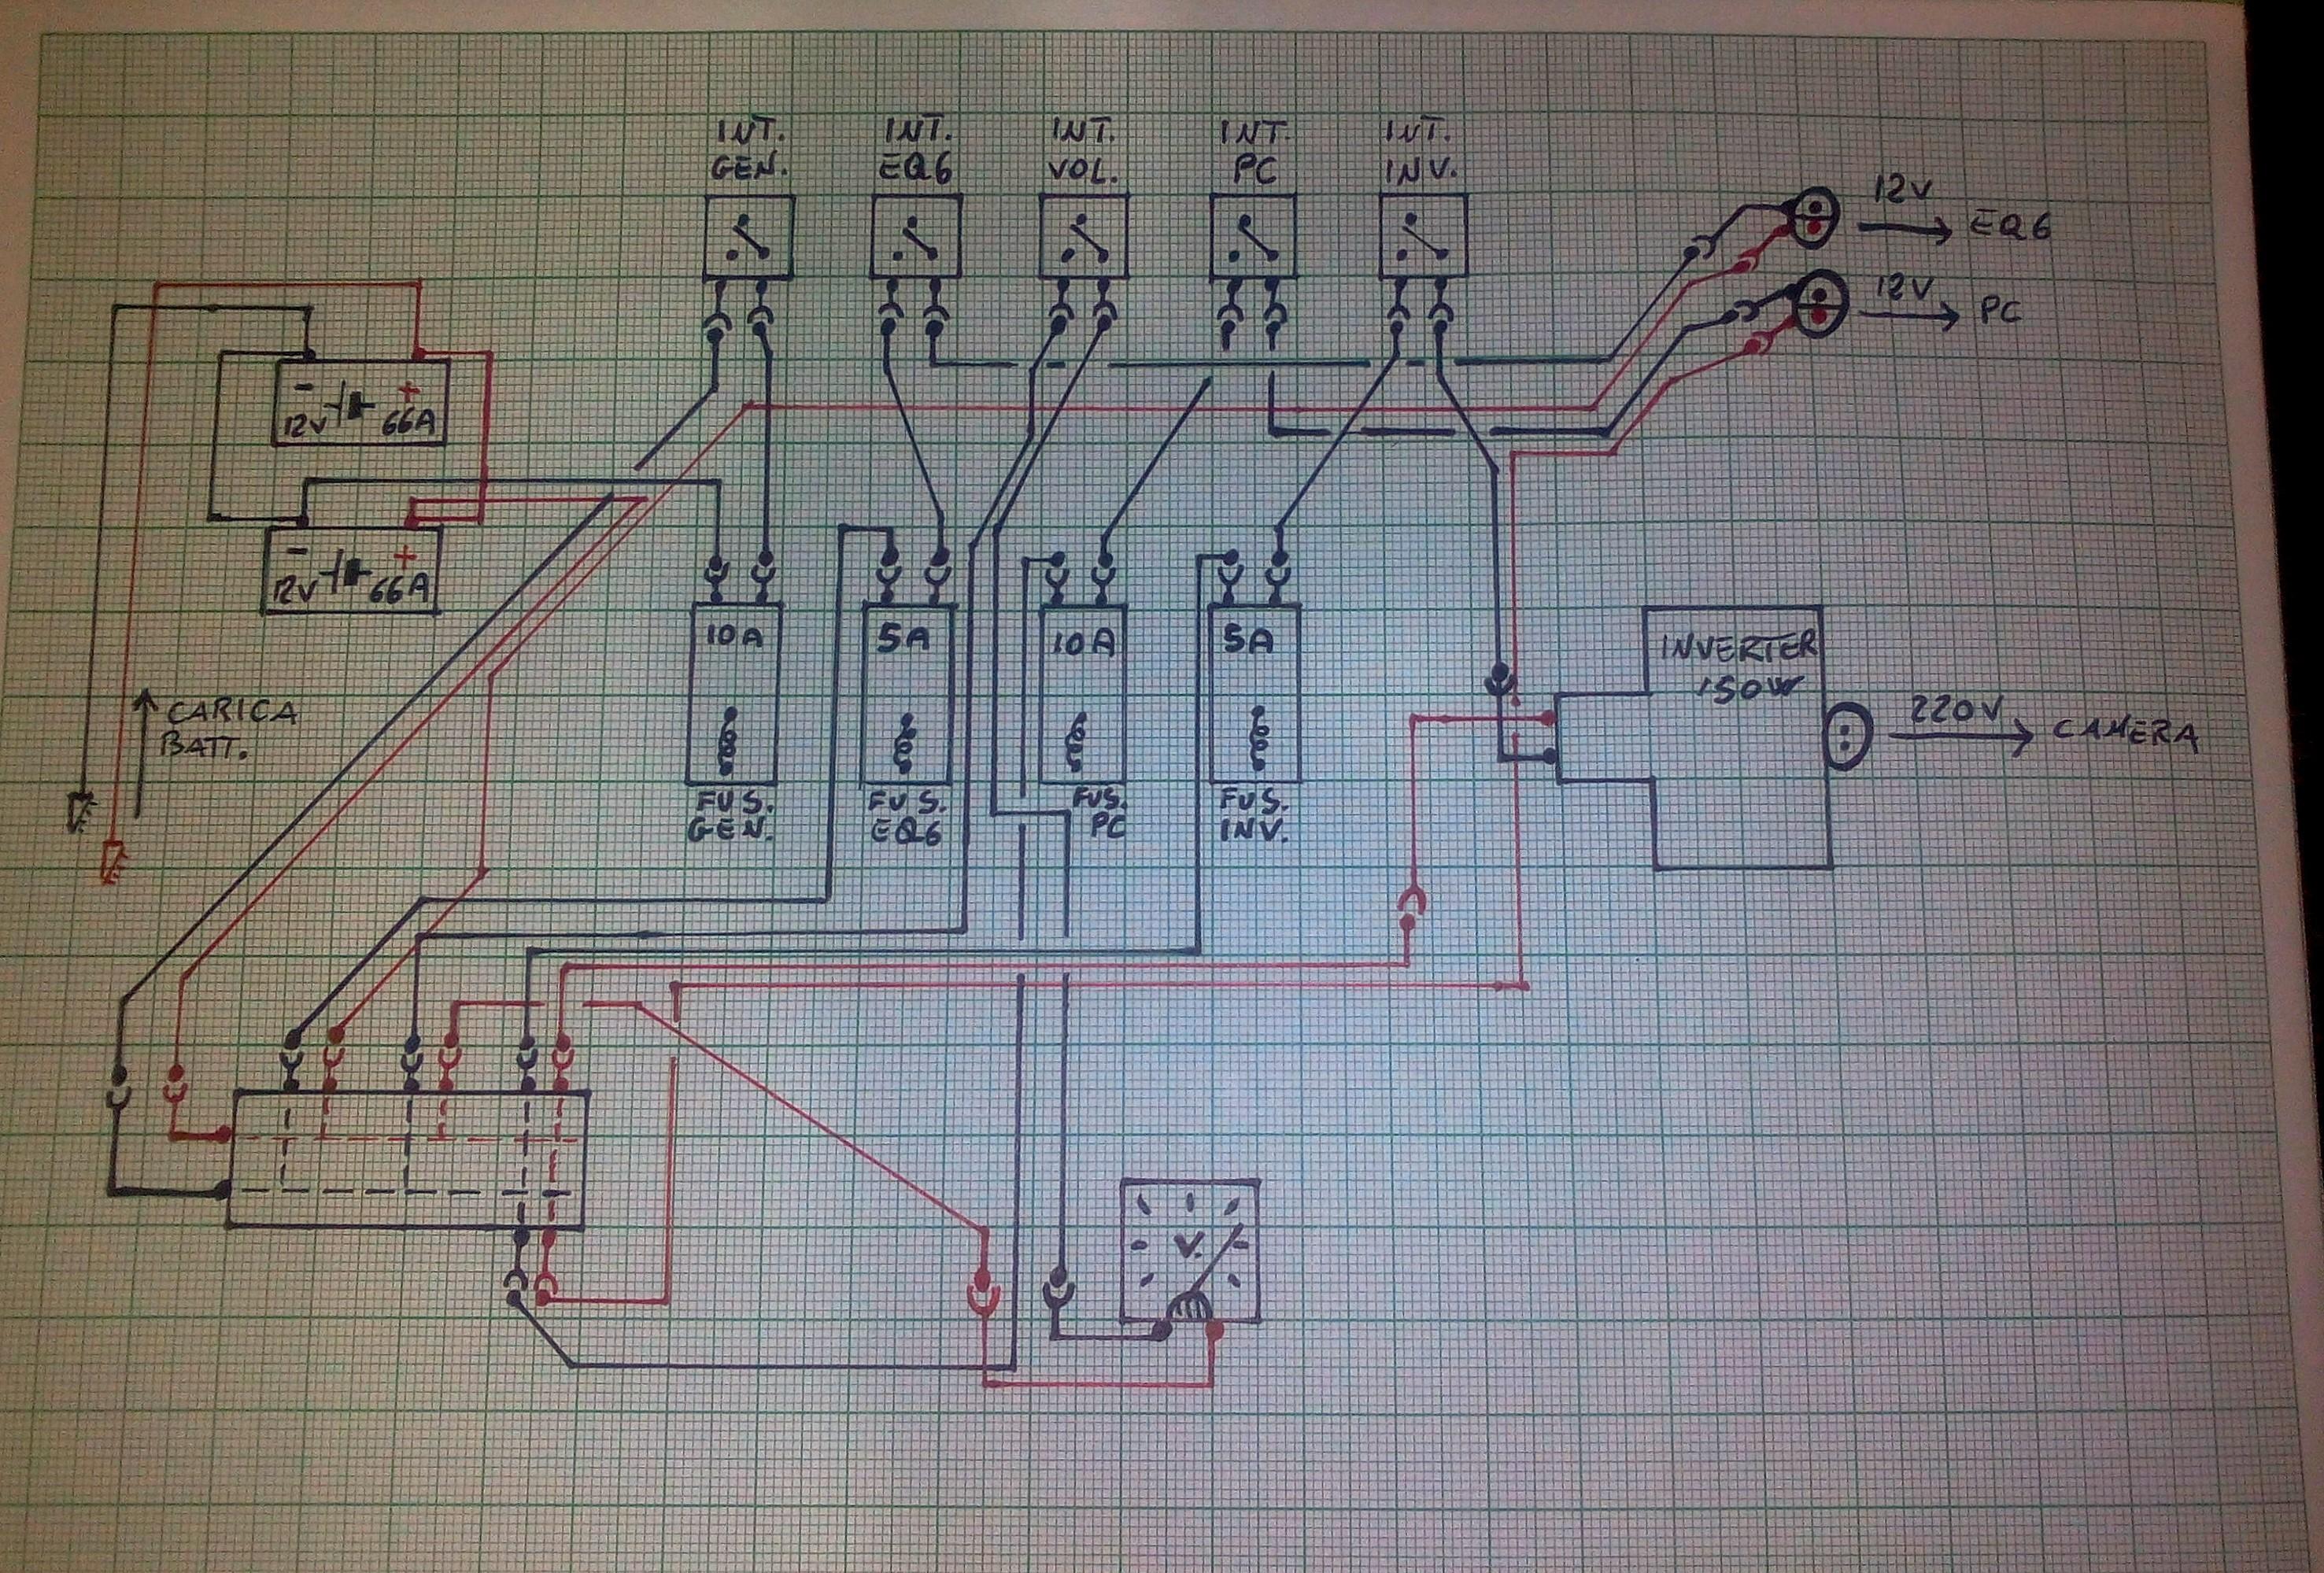 Schema Elettrico : Schema elettrico piero img